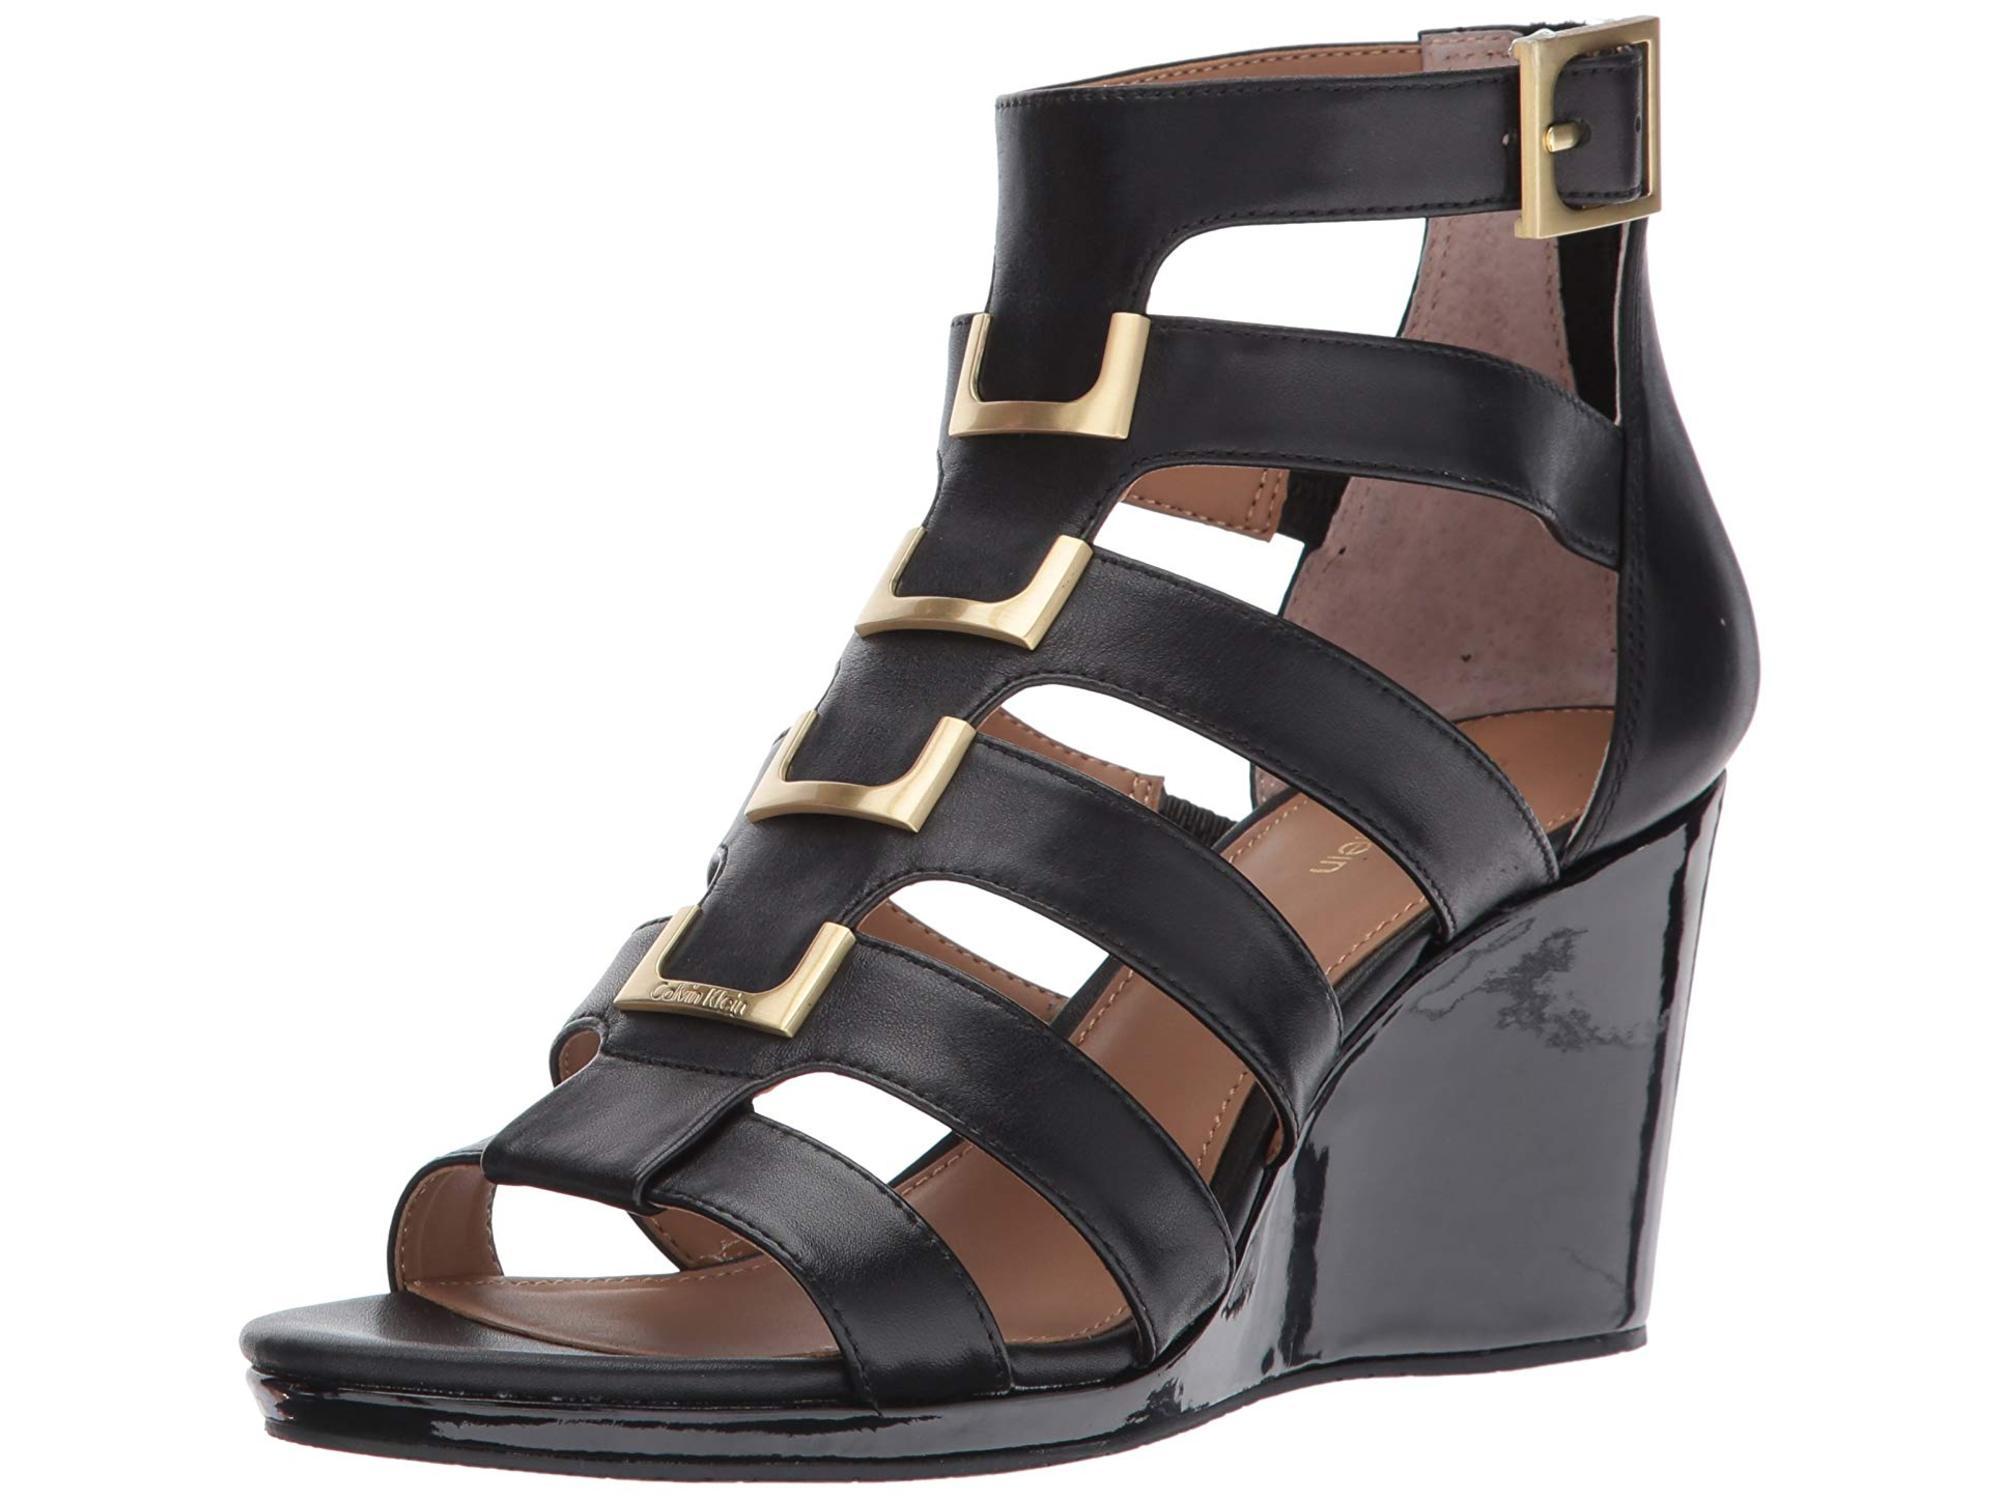 00d77a8bb482 Calvin Klein Womens Brilla Leather Open Toe Formal Strappy